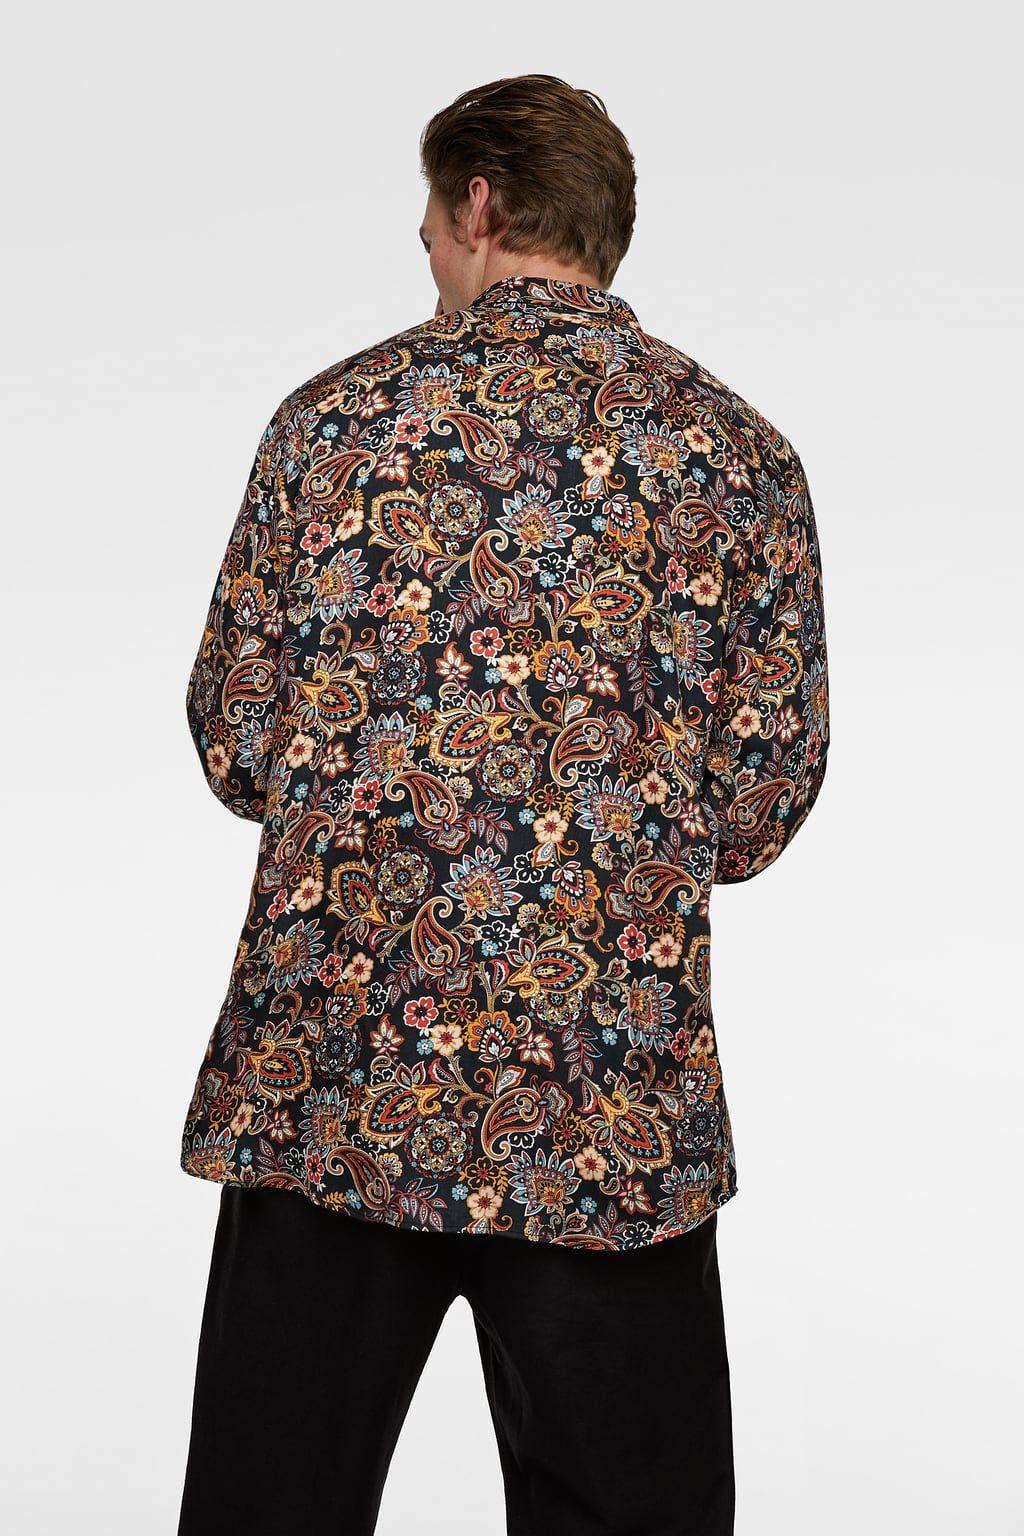 camisetas zara hombre chile